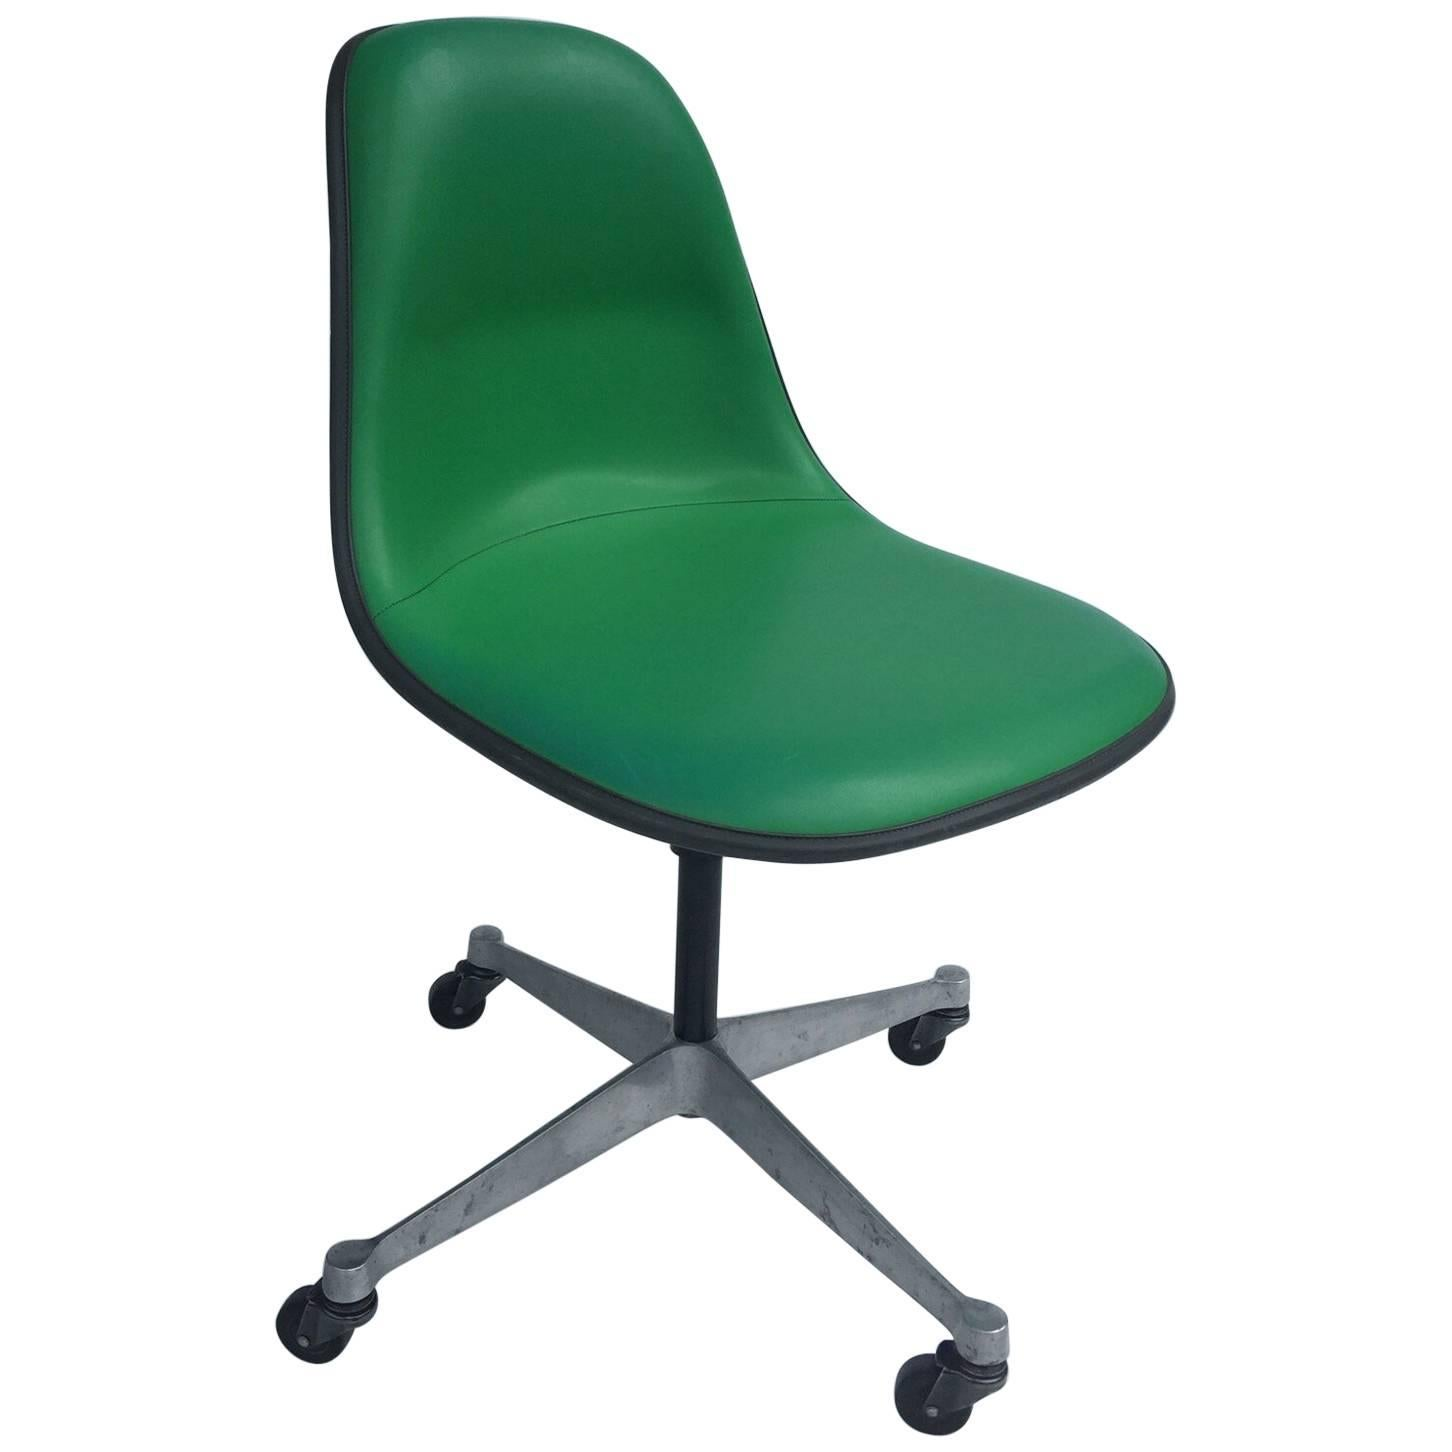 Herman Miller Eames PSCA Swivel Chair